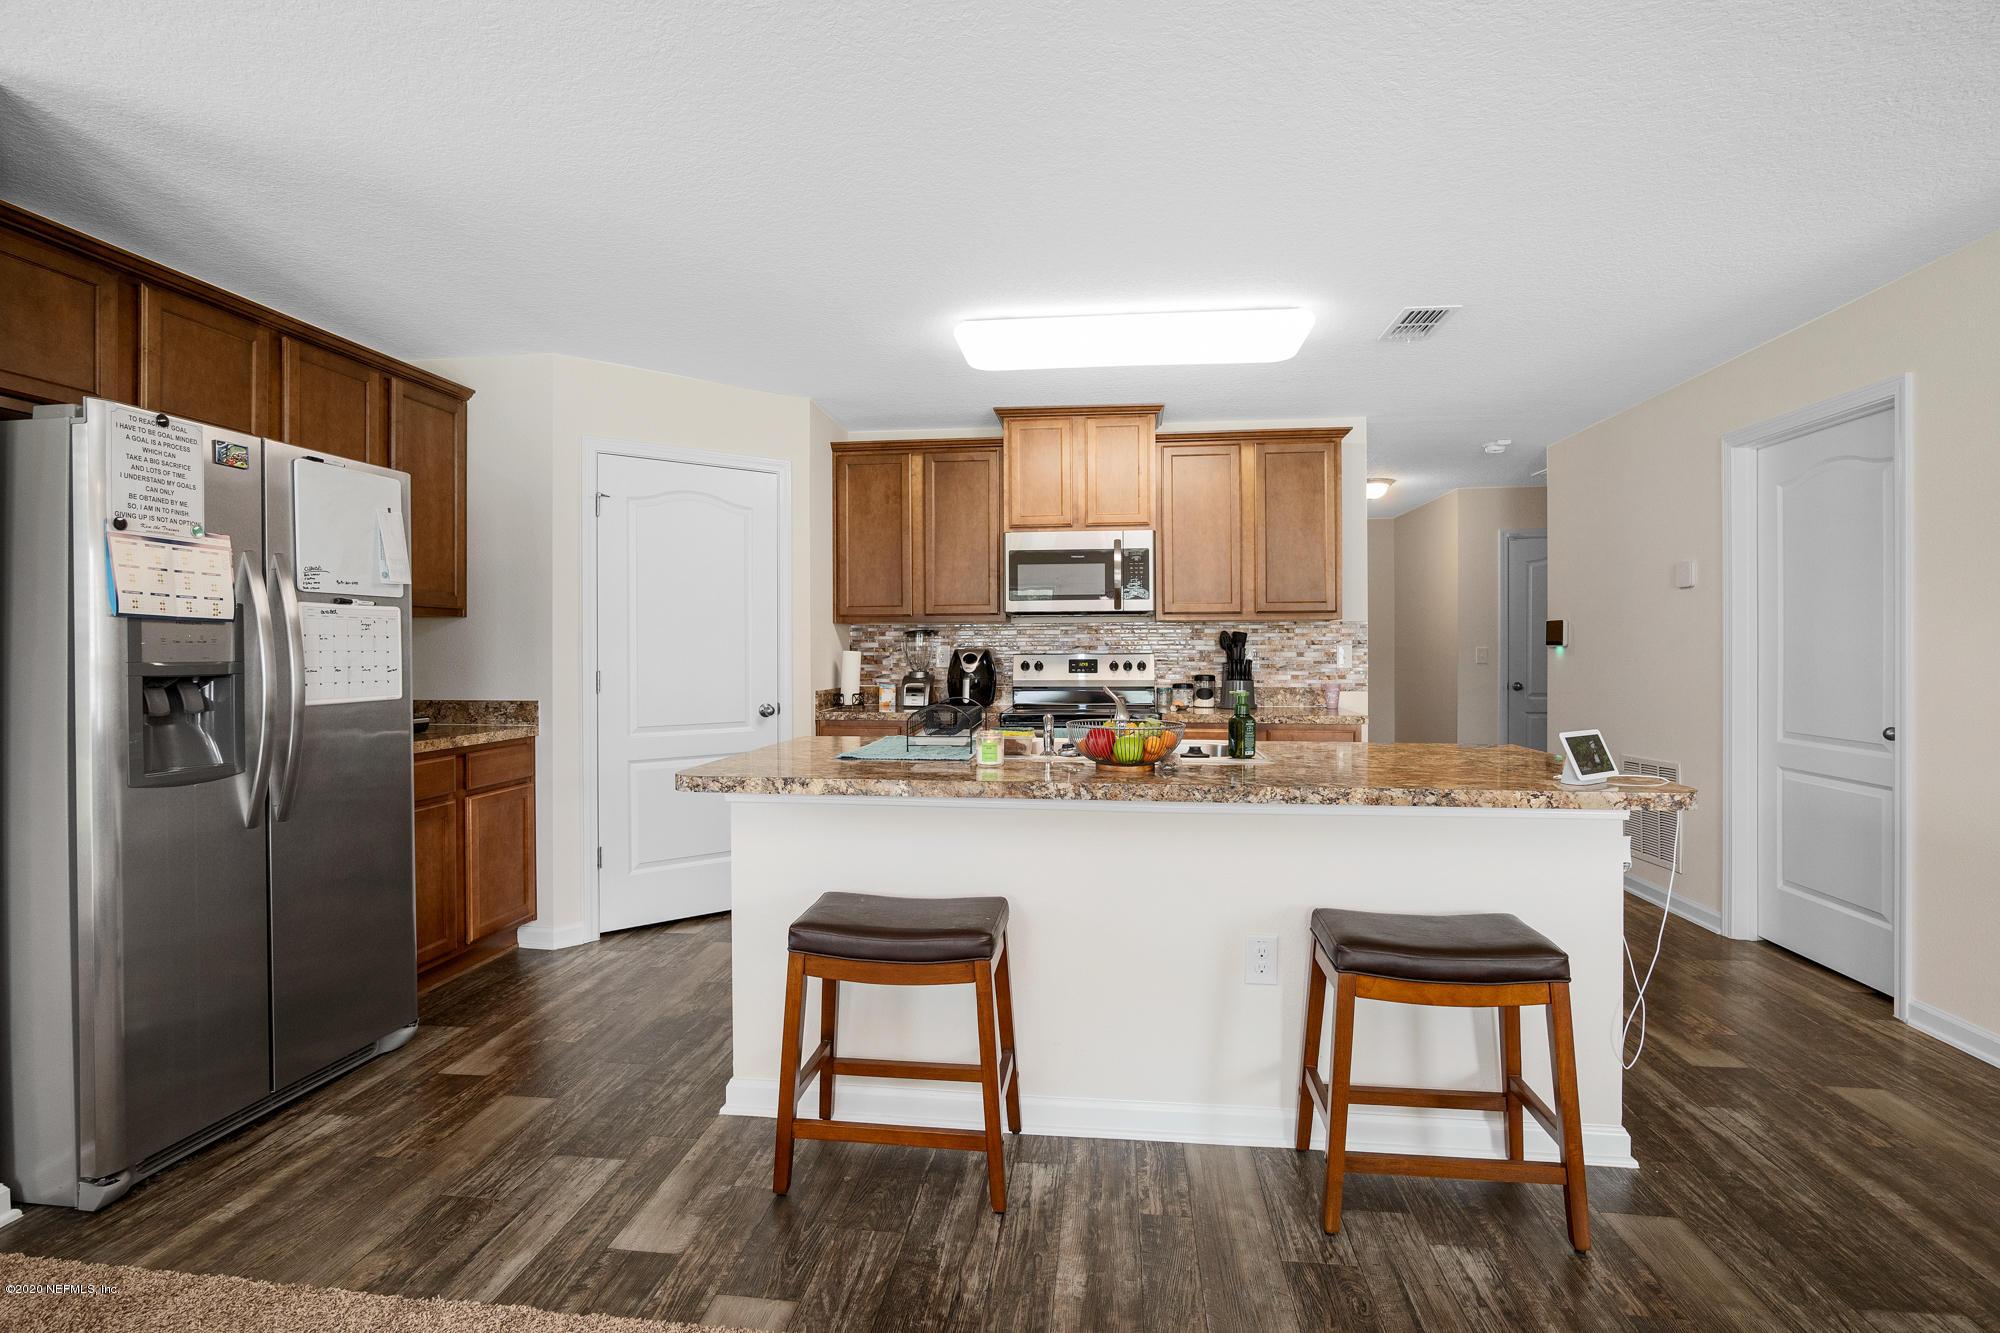 6770 HANFORD, JACKSONVILLE, FLORIDA 32219, 3 Bedrooms Bedrooms, ,2 BathroomsBathrooms,Residential,For sale,HANFORD,1080848